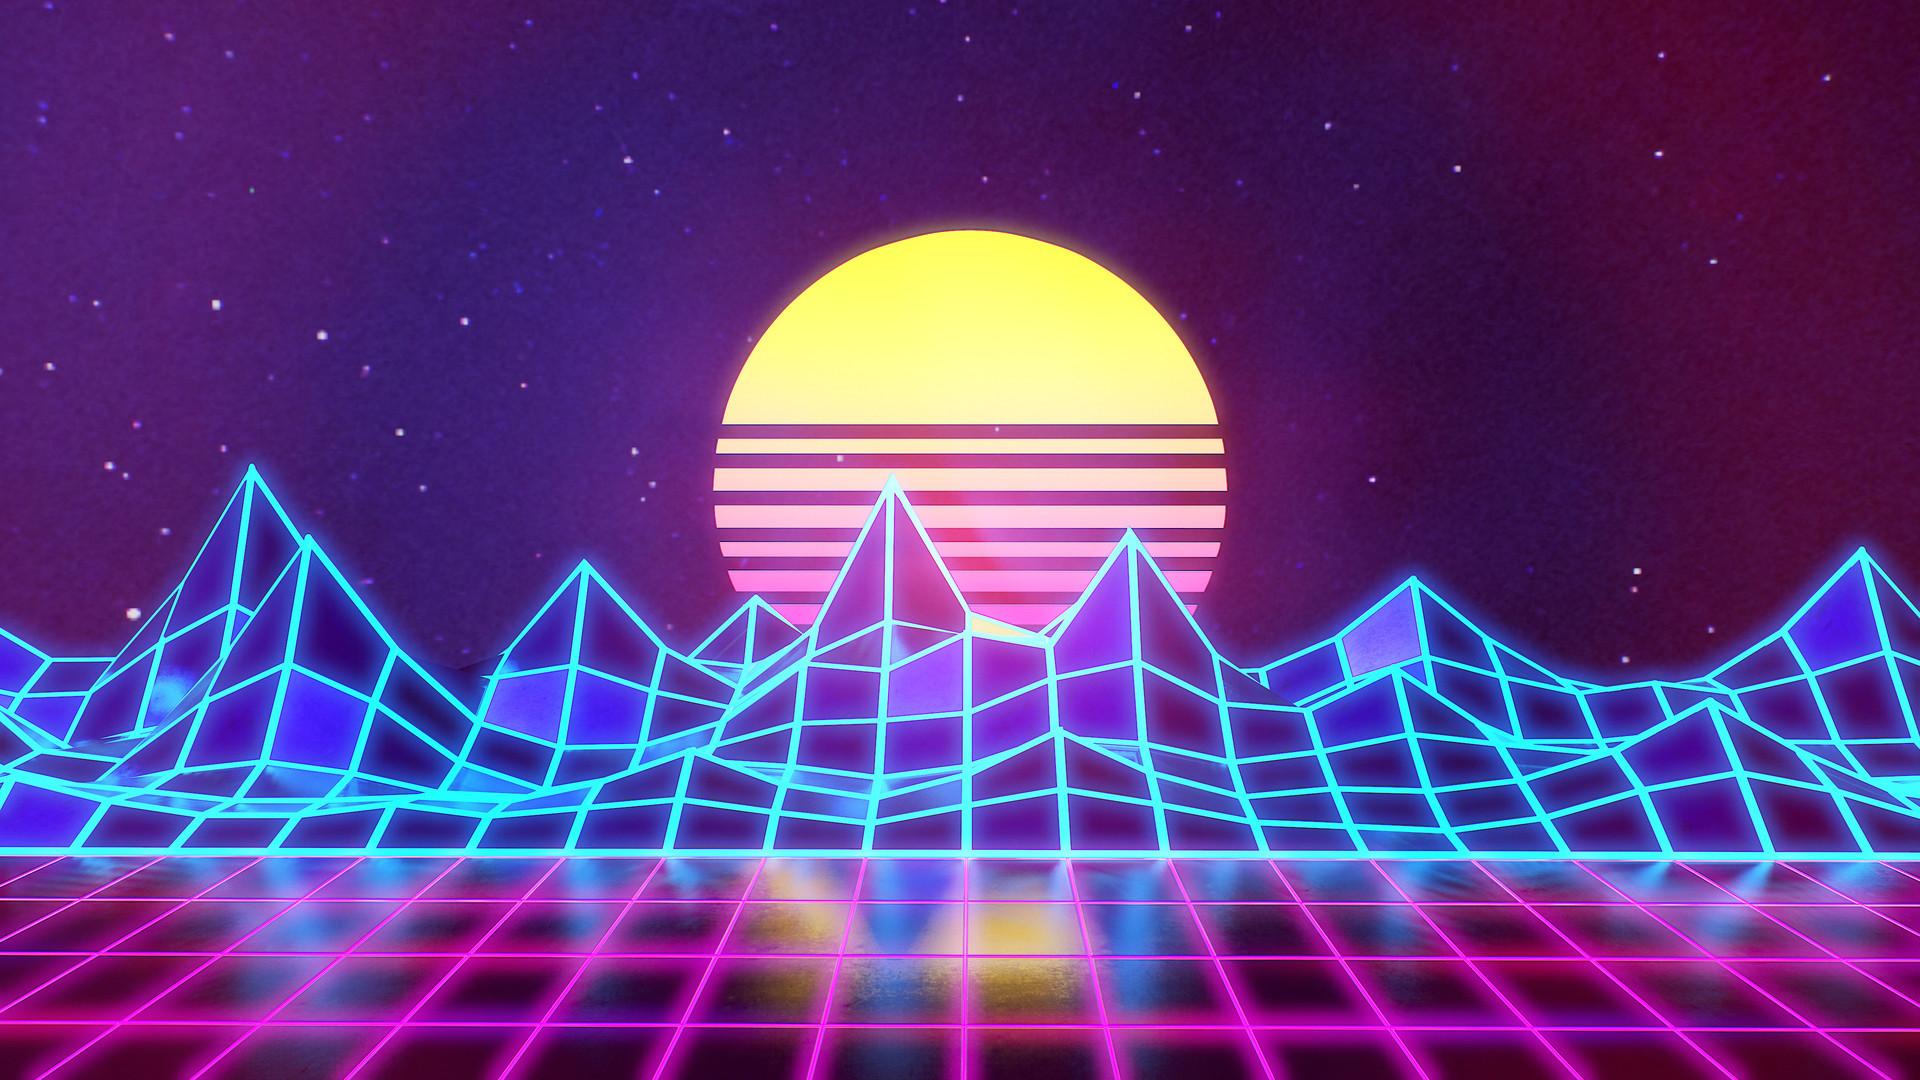 Rafaël De Jongh - Synthwave - Neon 80's - Background